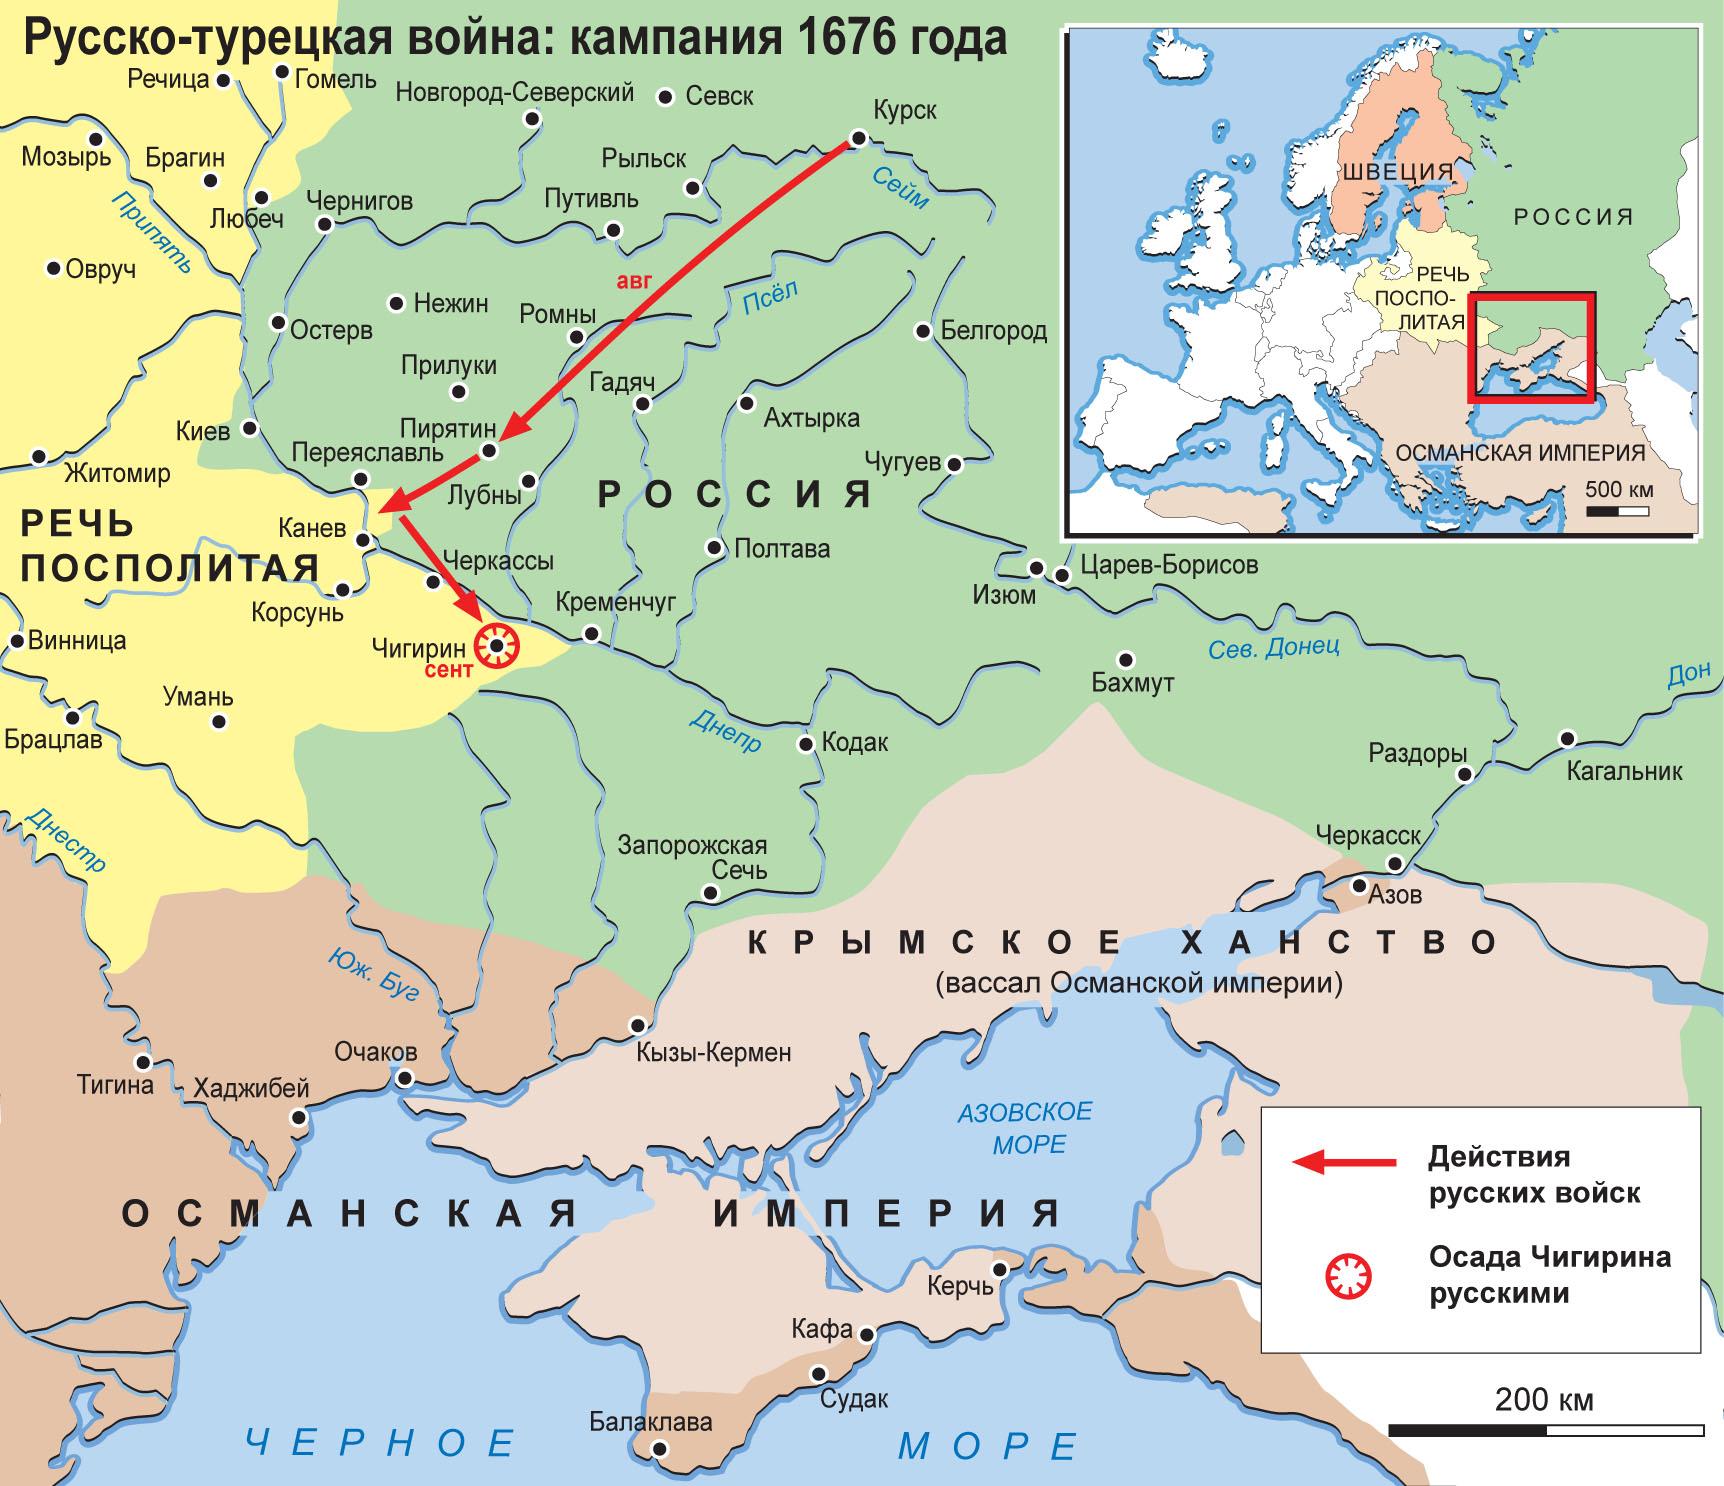 Кампания 1676 г.